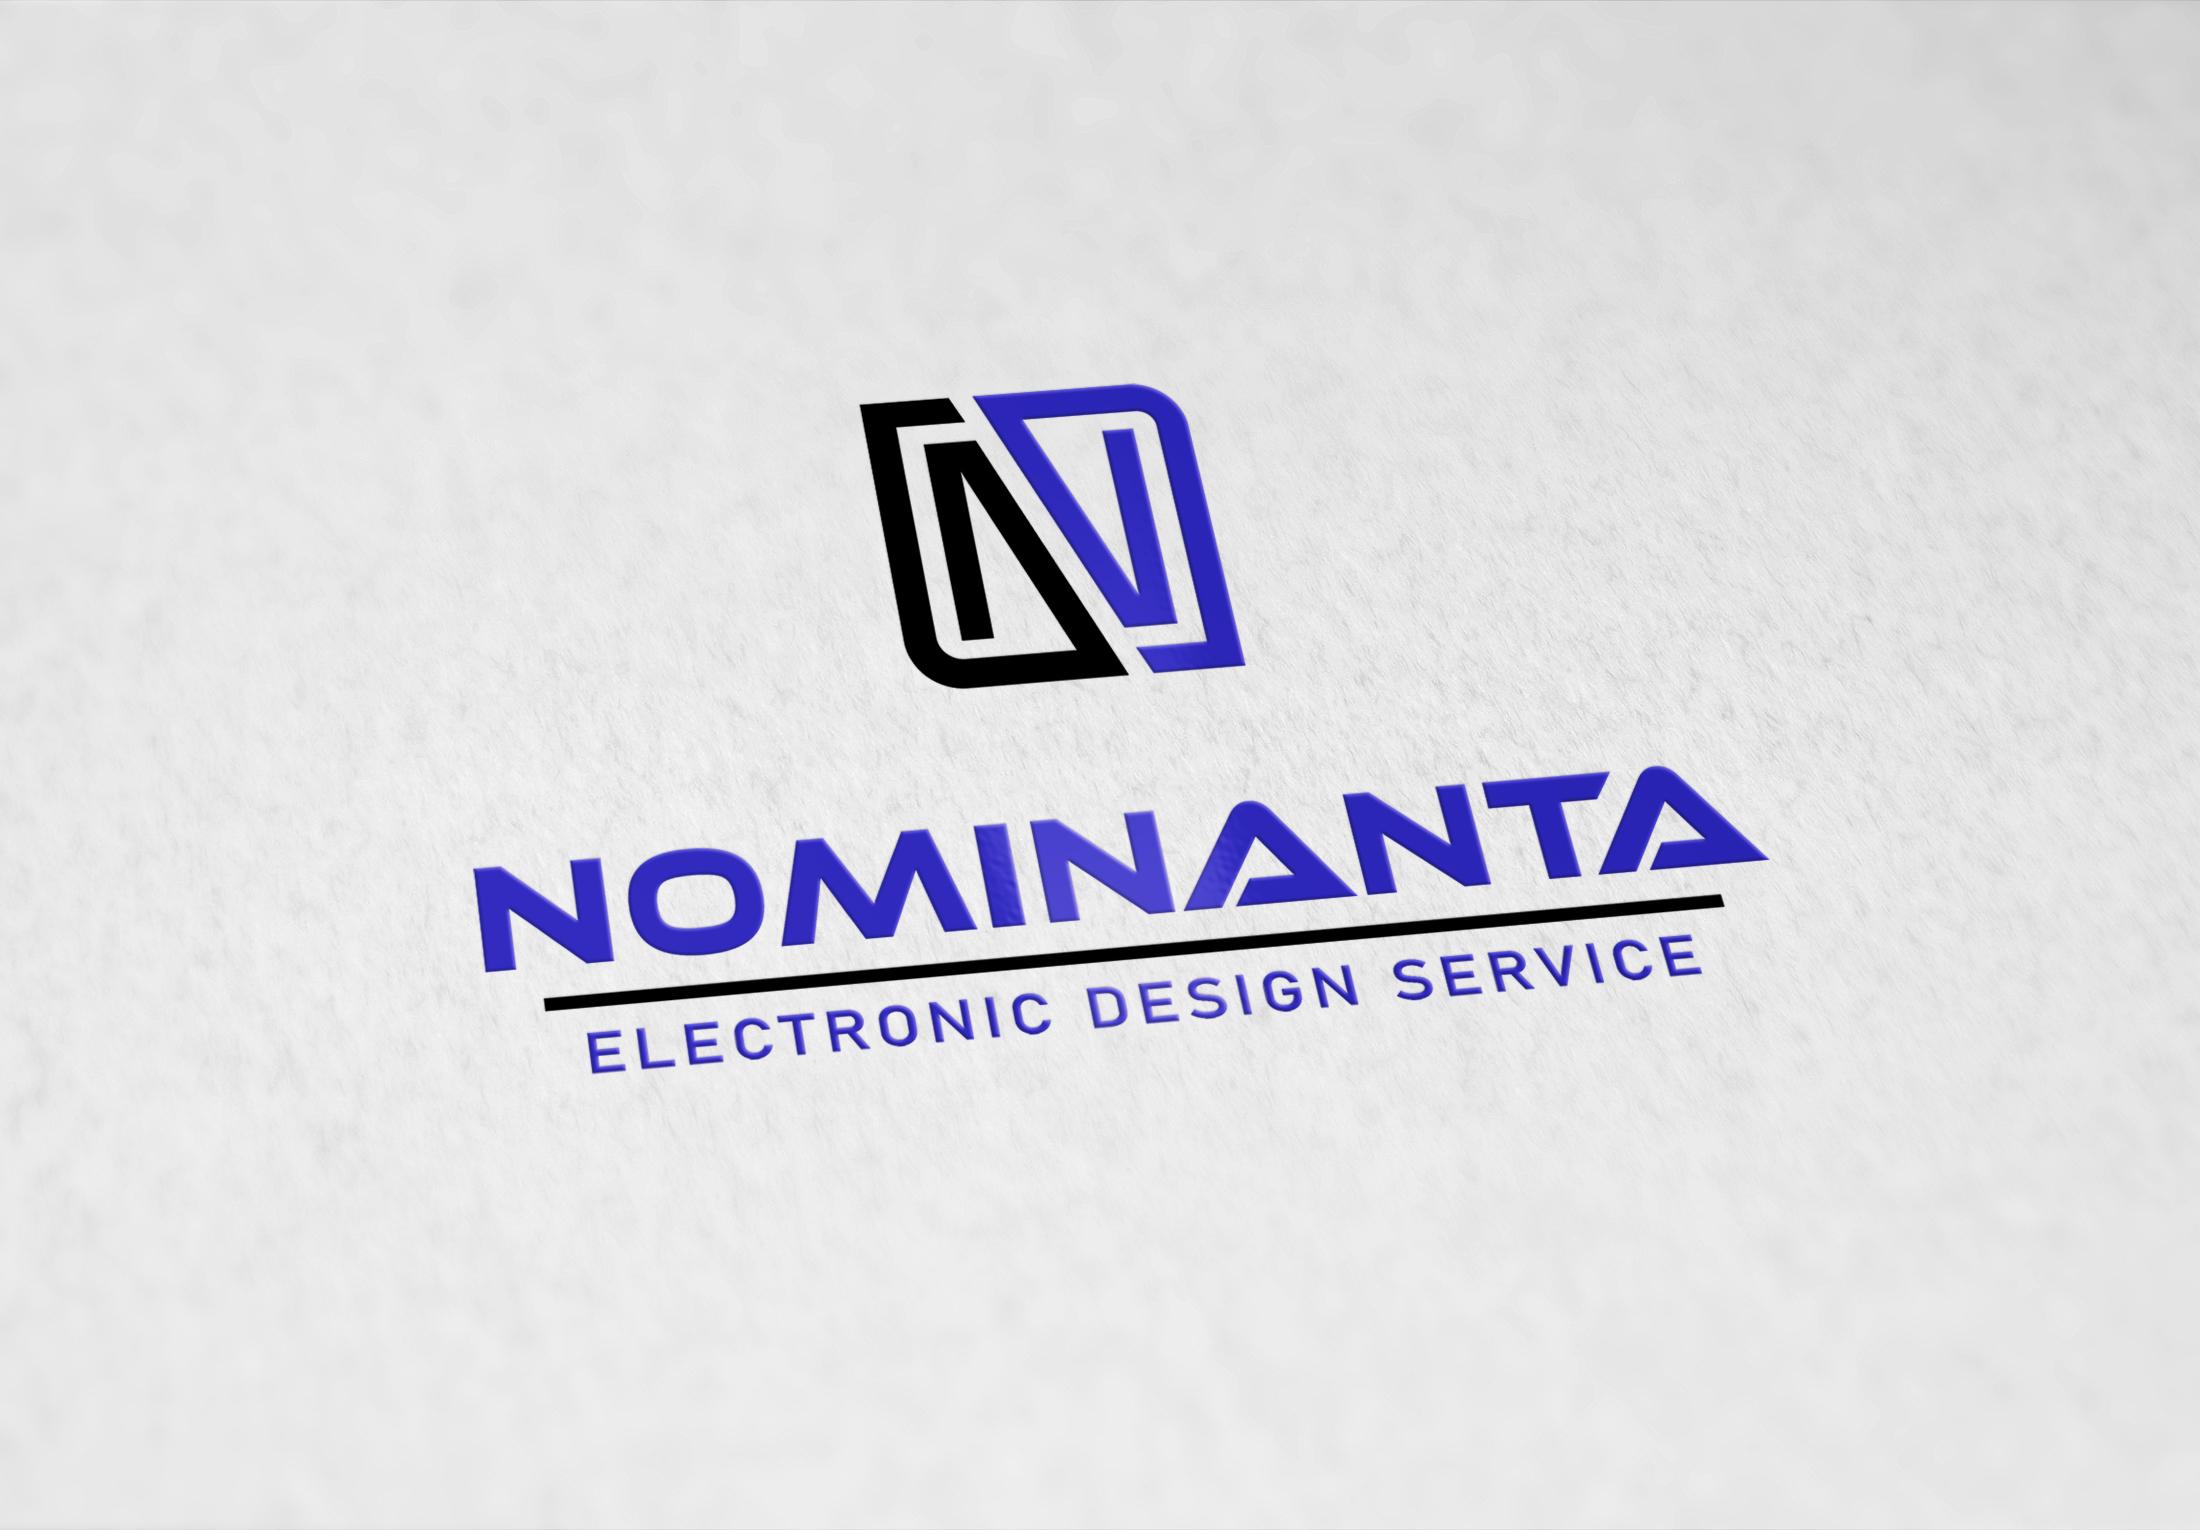 Разработать логотип для КБ по разработке электроники фото f_1965e42d9f768670.jpg